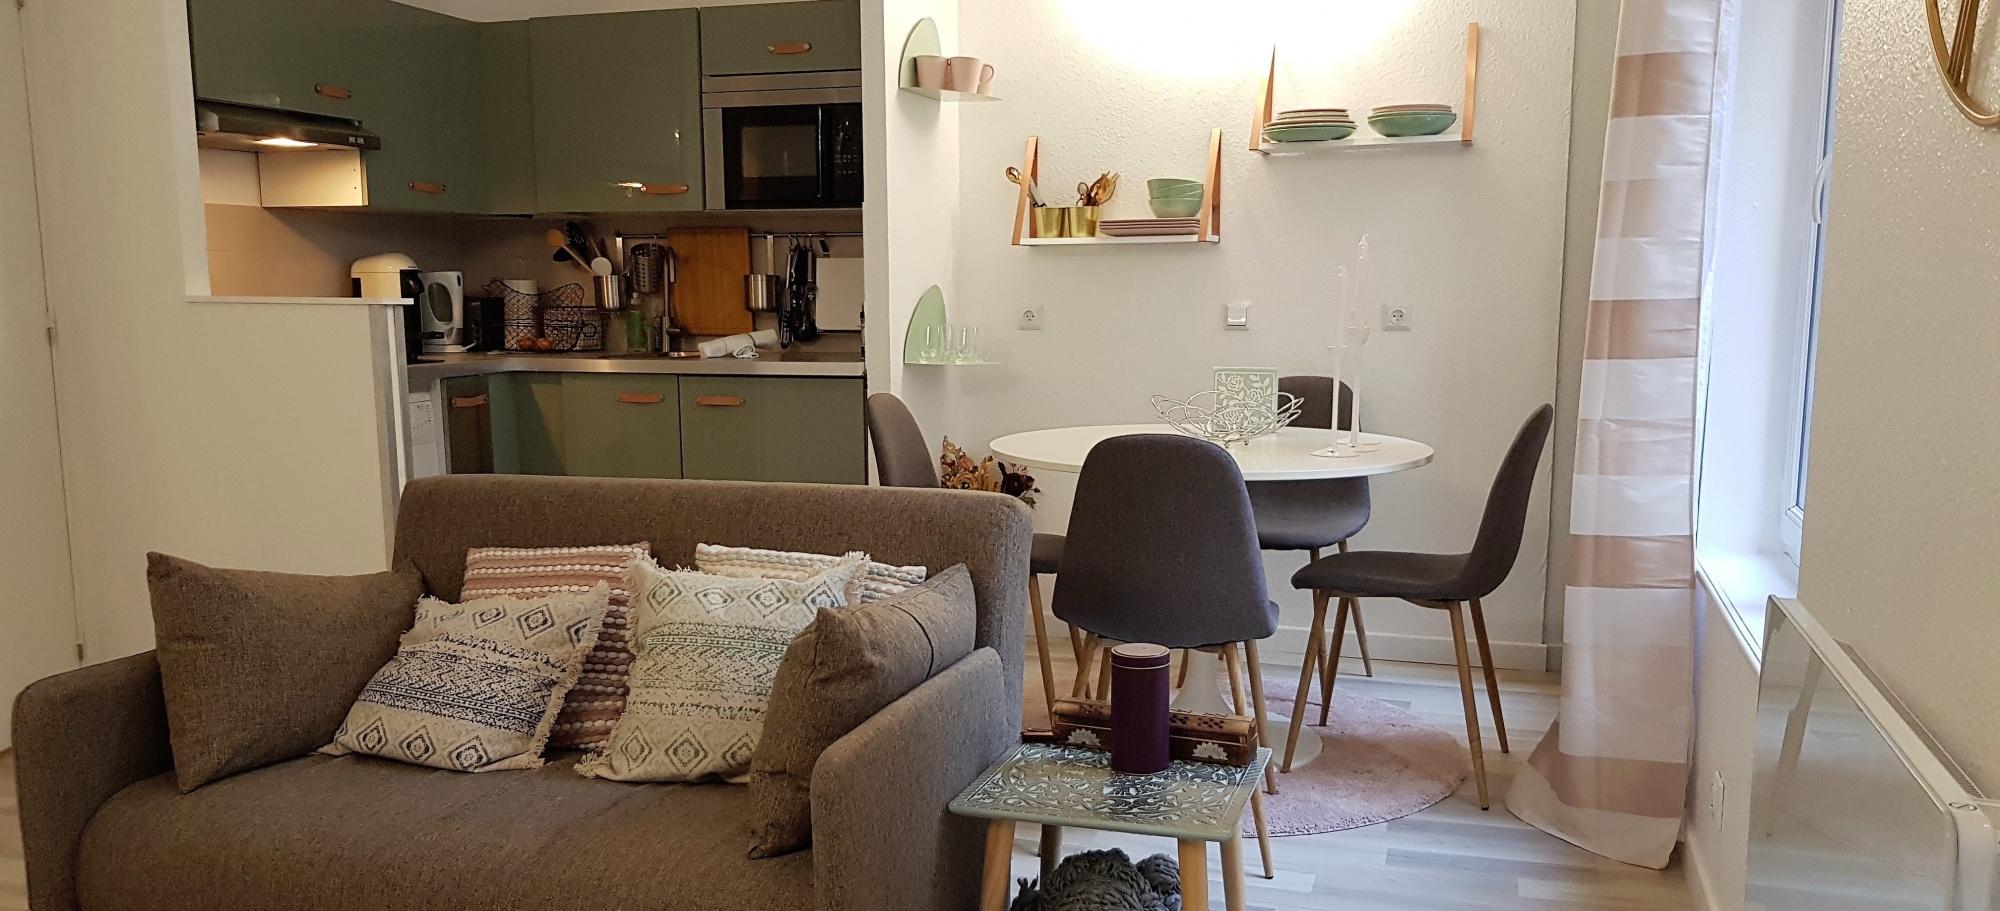 appart hotel appart h tel lille penelope in meta ville. Black Bedroom Furniture Sets. Home Design Ideas